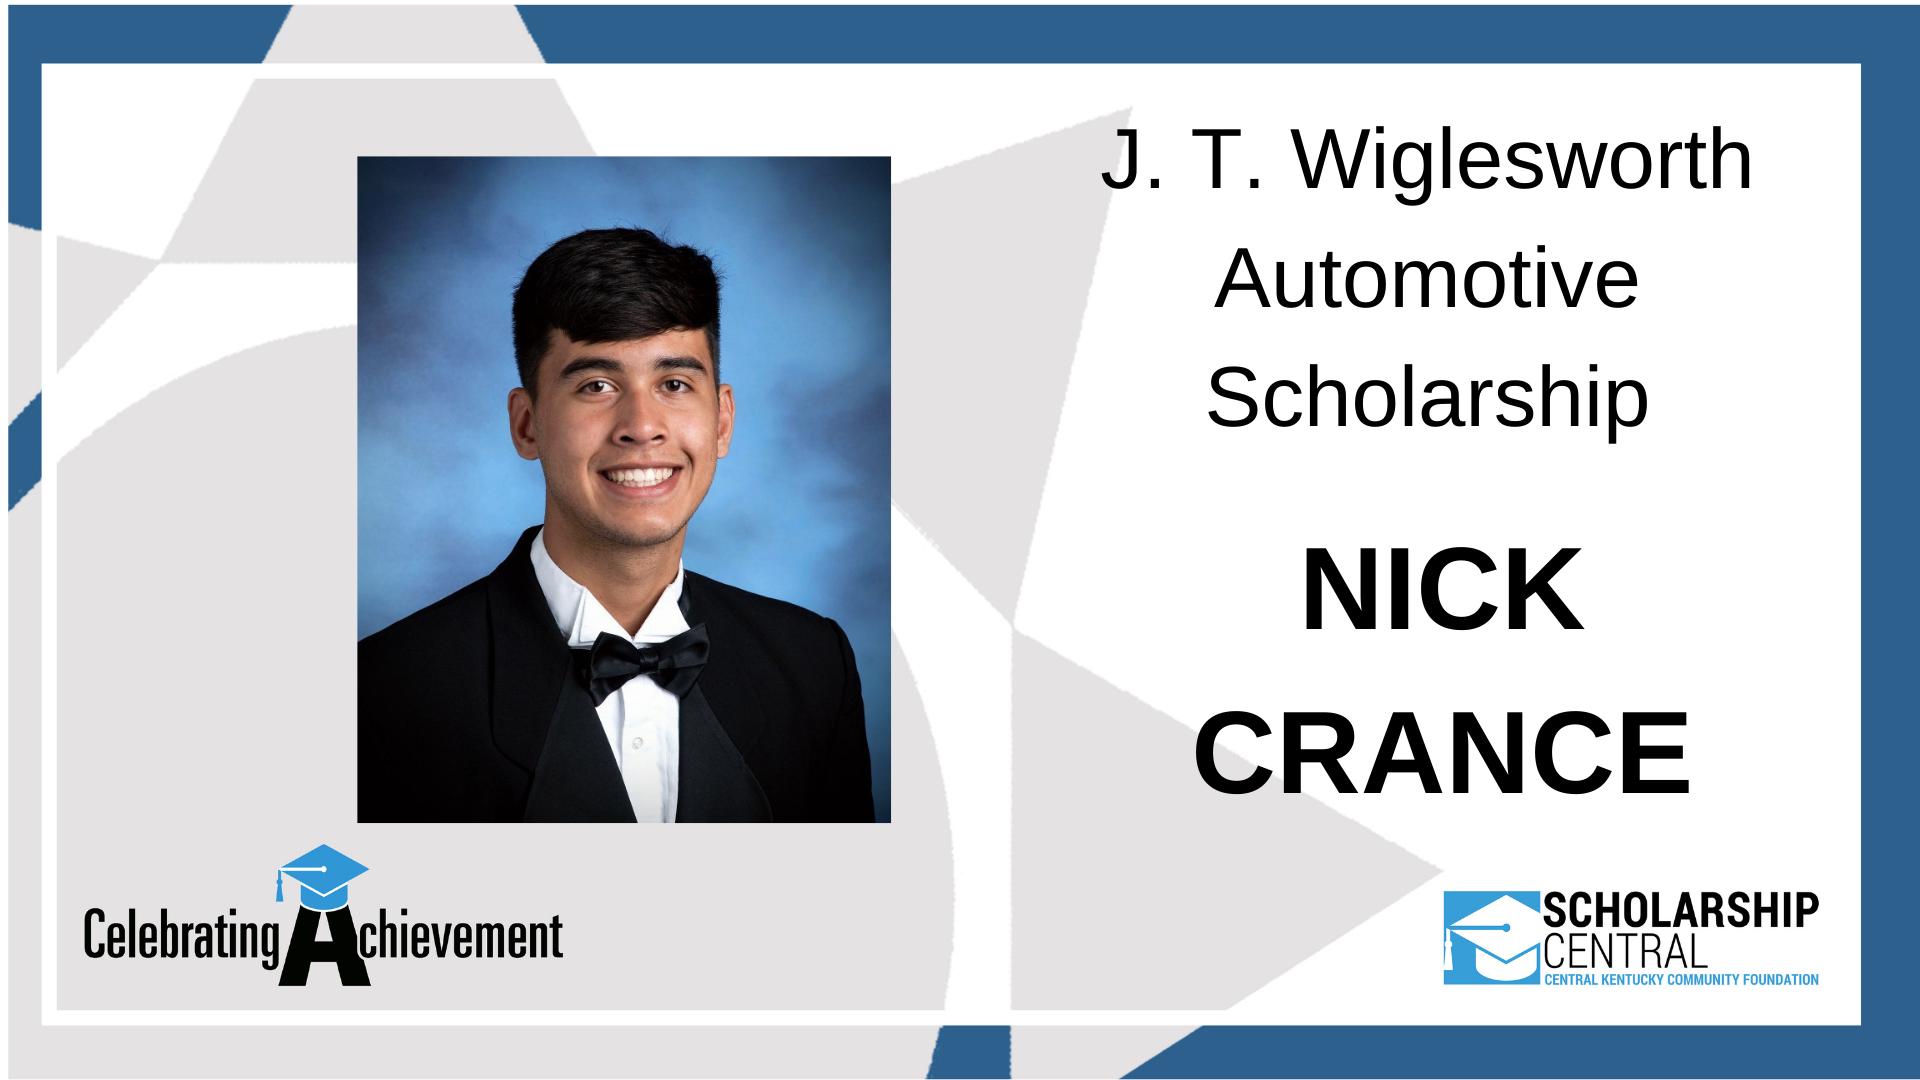 JT Wiglesworth Automotive Scholarship Winner